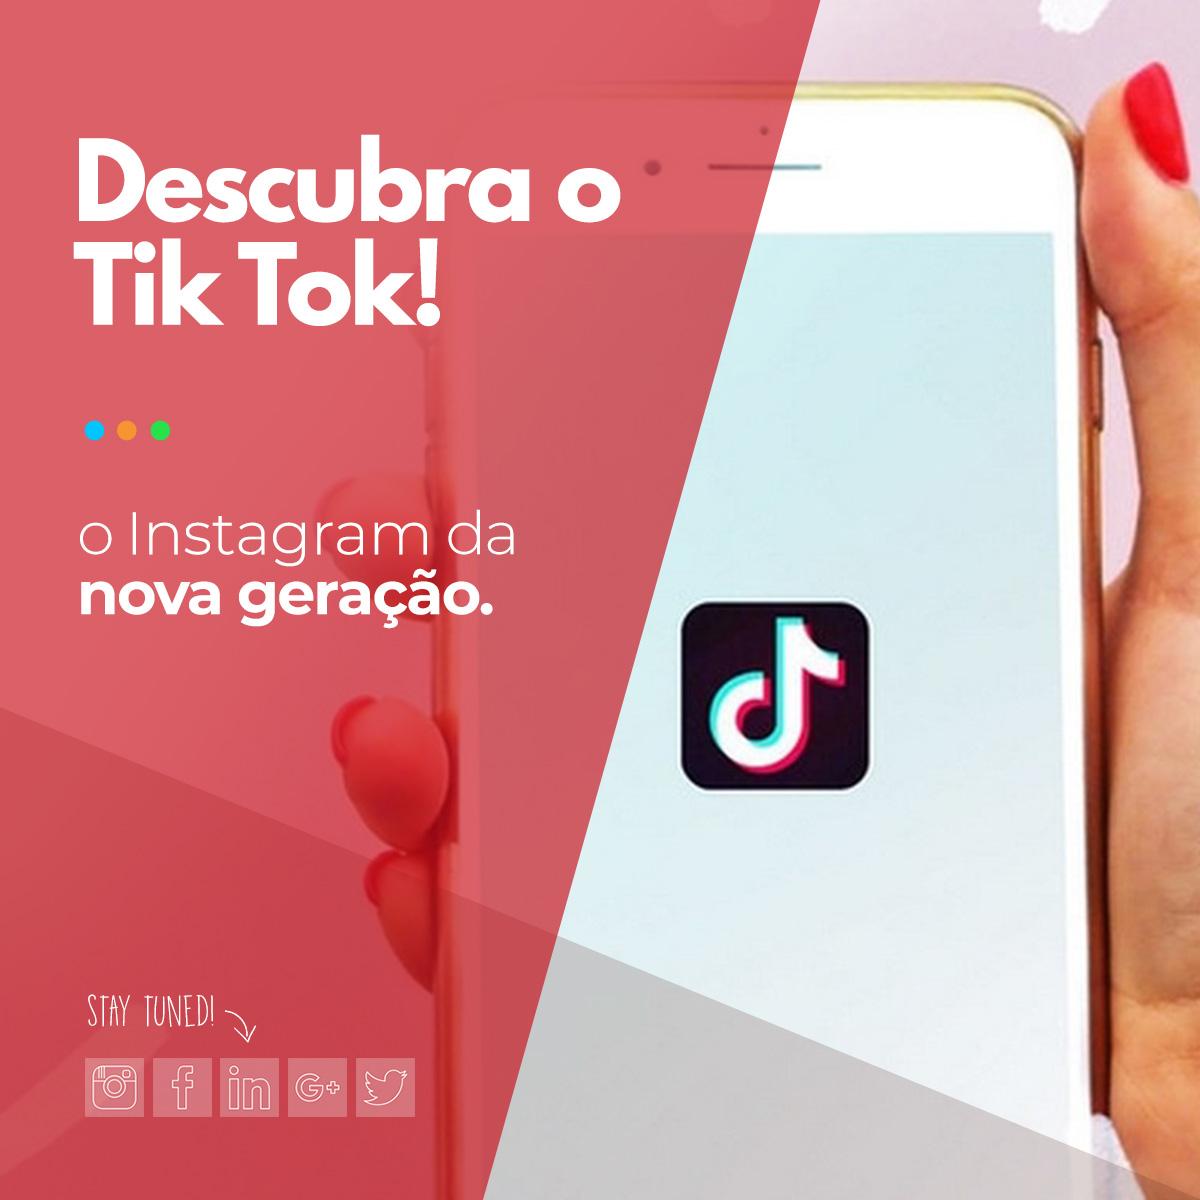 DescubraoTikTok